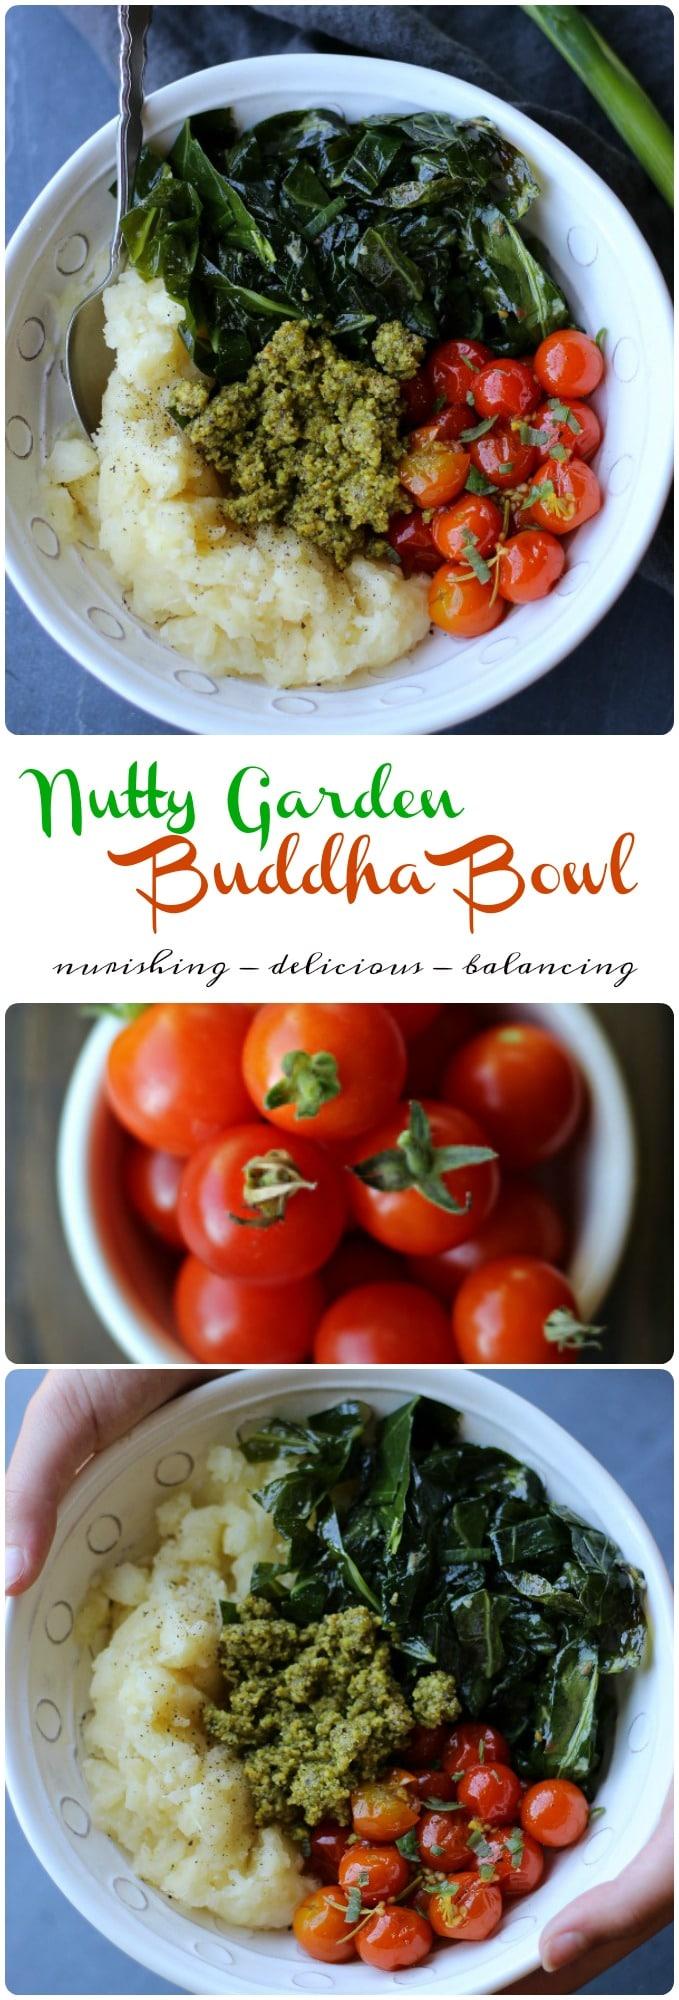 Garden inspired Vegan Buddha Bowl jammed packed with the best earthy flavors! gardeninthekitchen.com